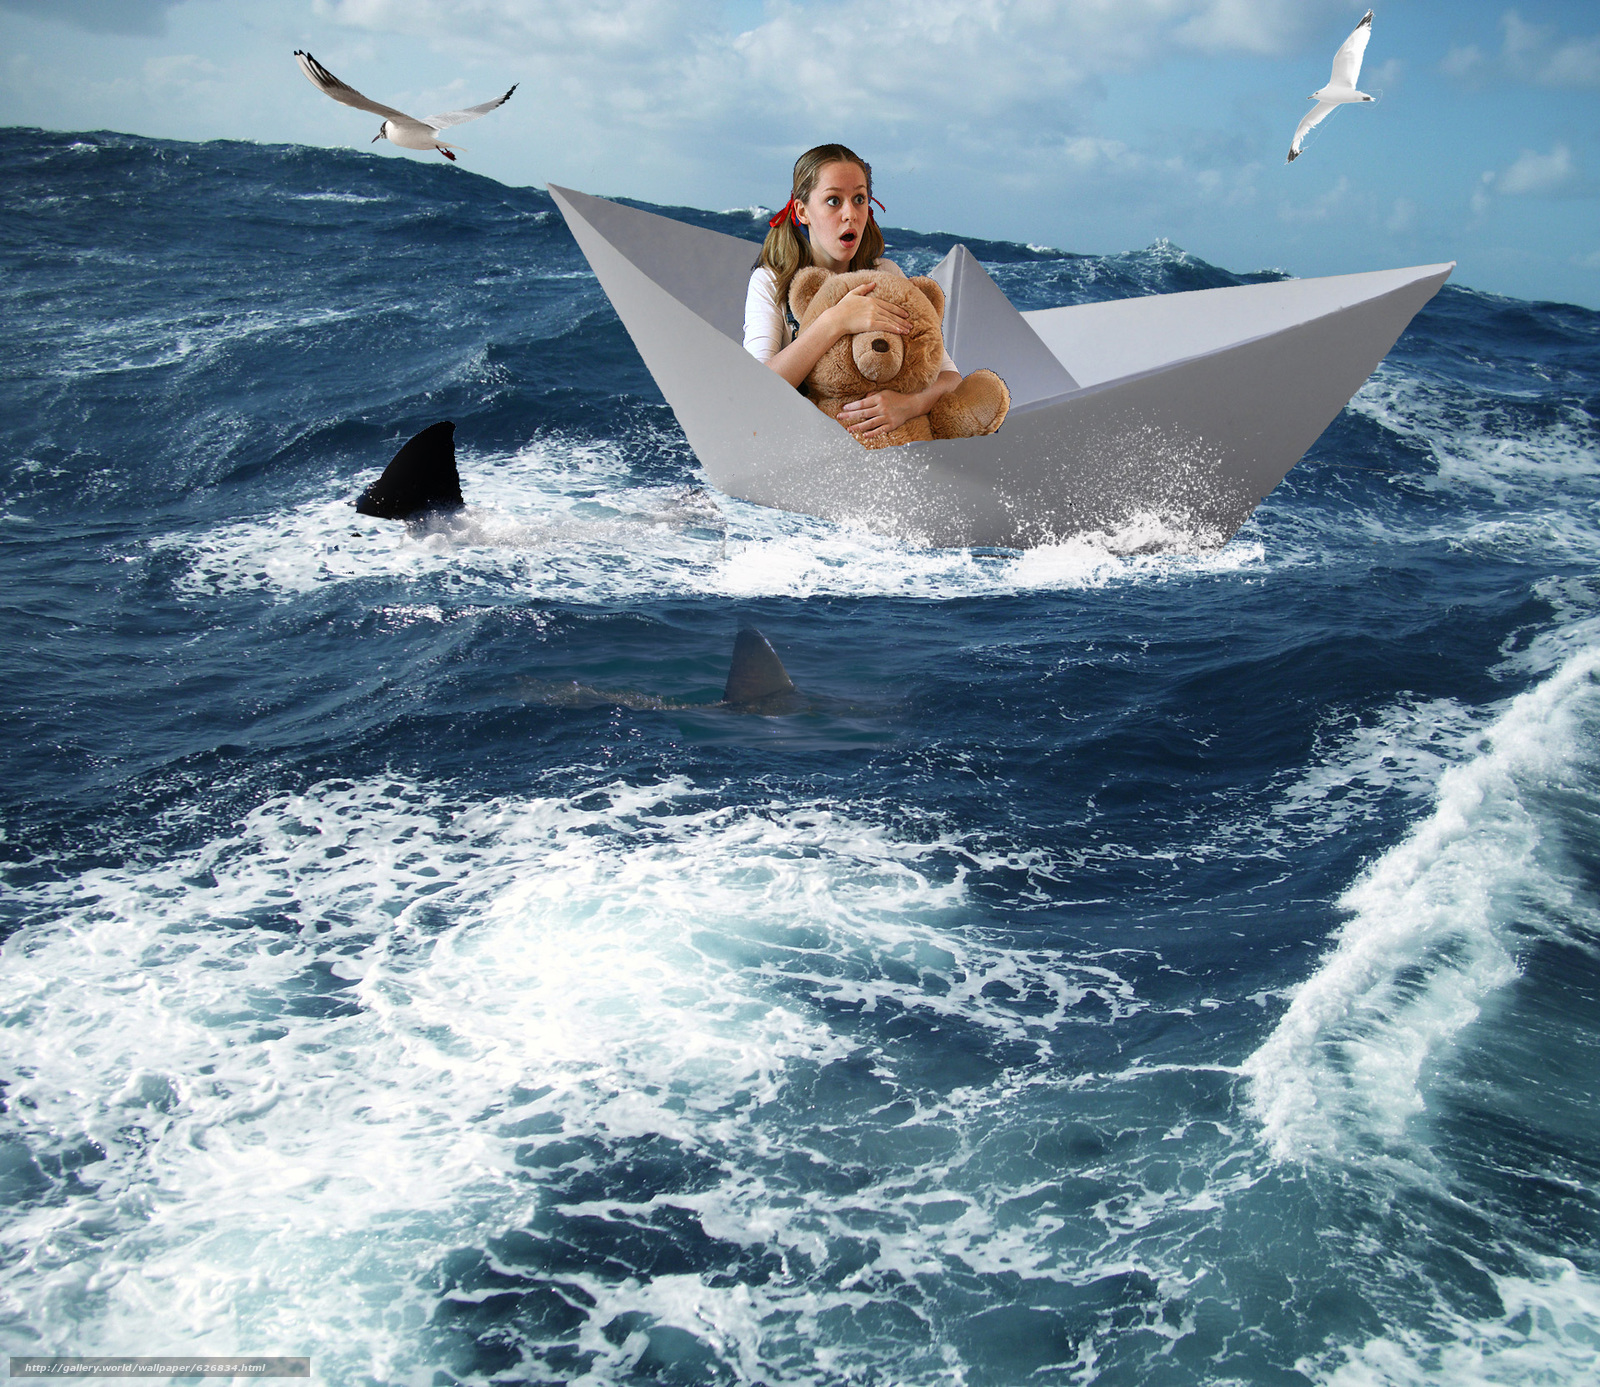 море, бумажный кораблик, девушка, акулы